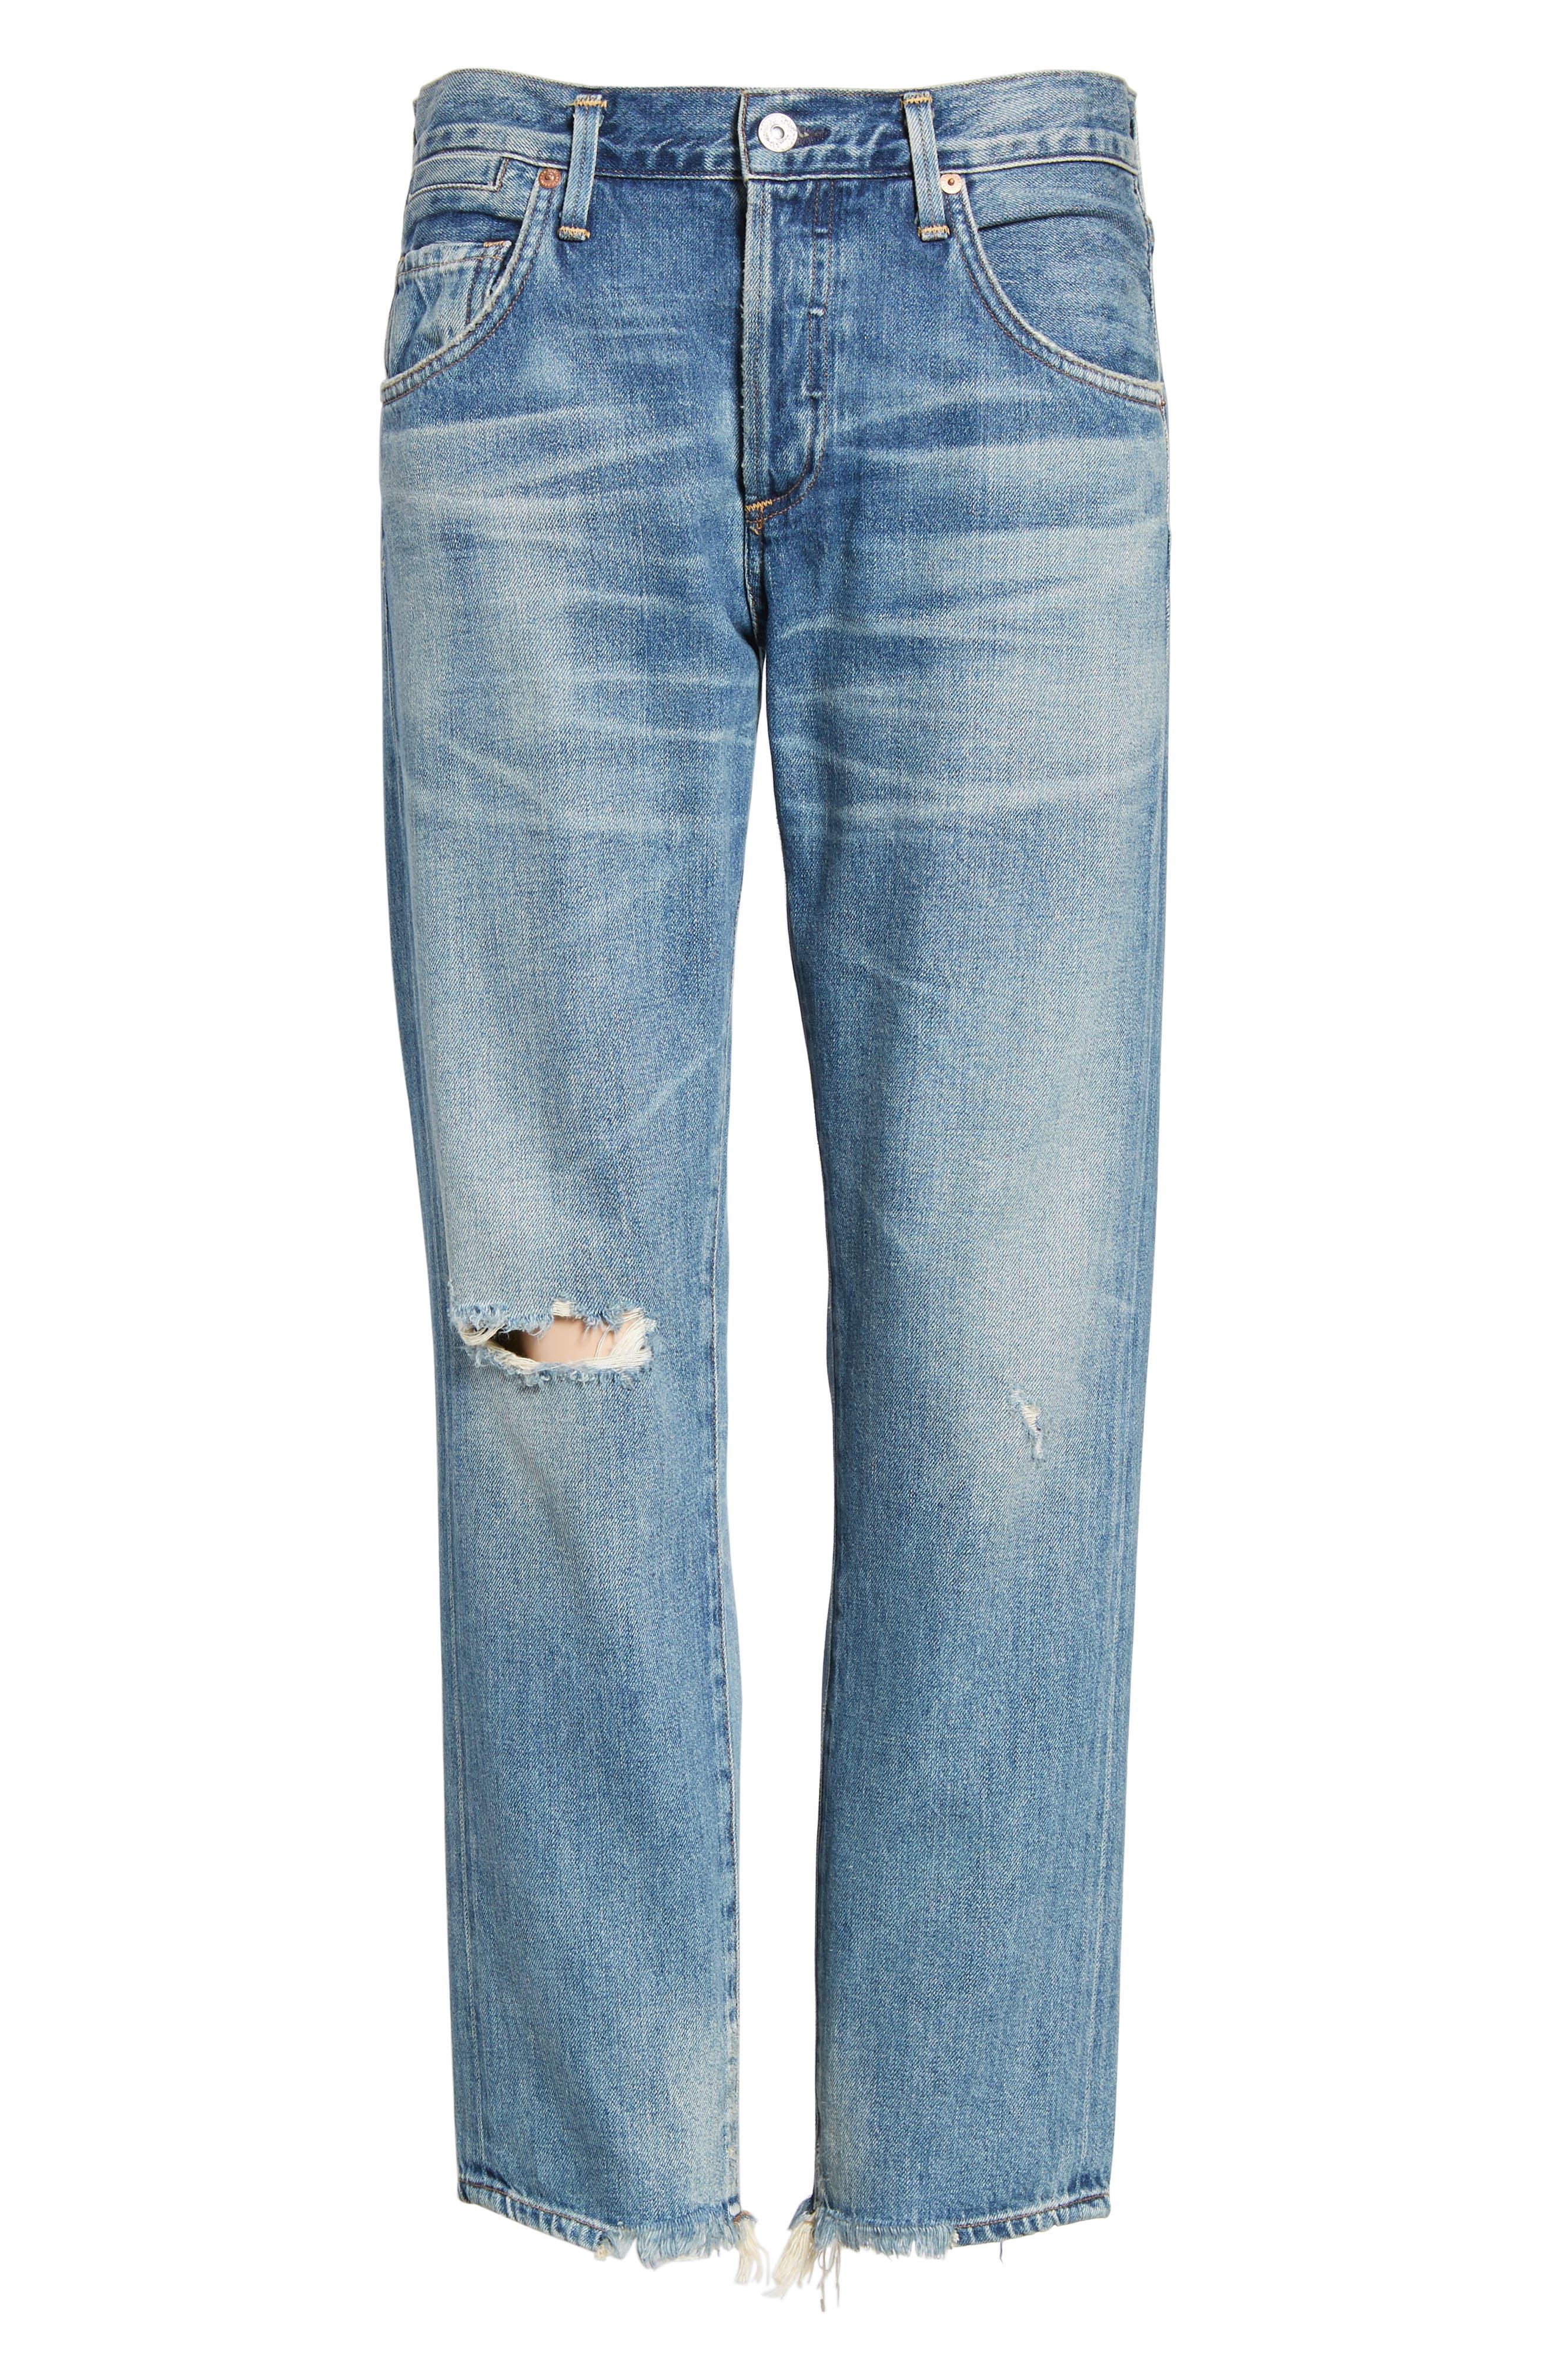 CITIZENS OF HUMANITY, Emerson Slim Boyfriend Jeans, Alternate thumbnail 7, color, HAVEN